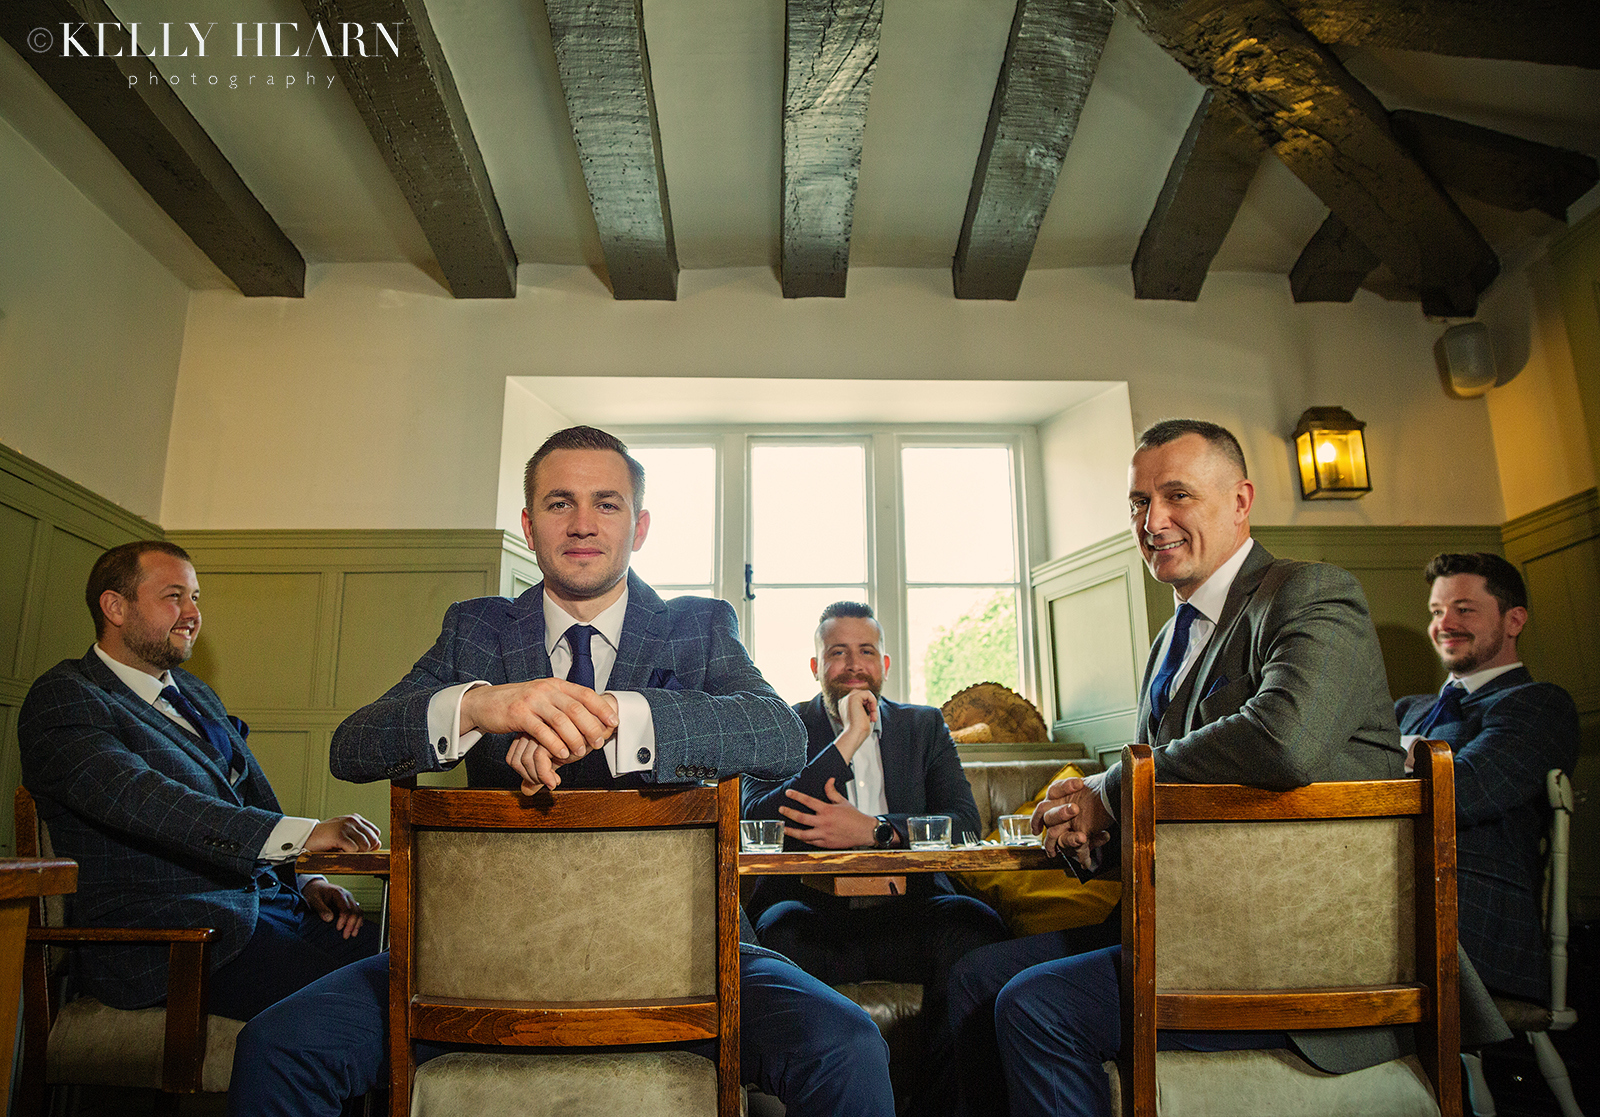 WALM_groomsmen-in-pub.jpg#asset:2482